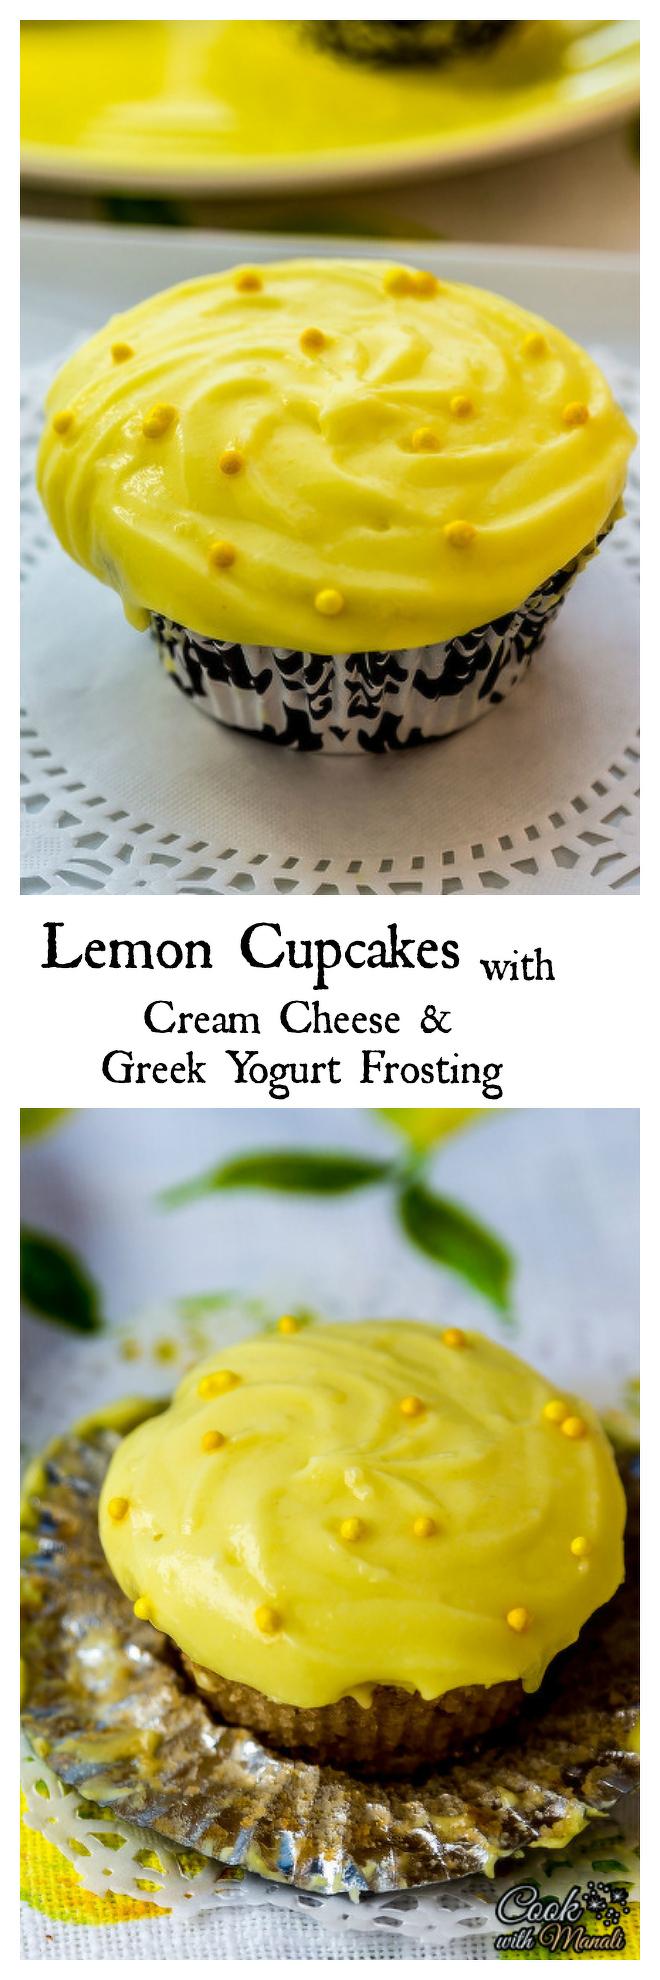 lemon-cupcakes-greek-yogurt-frosting-collage-nocwm